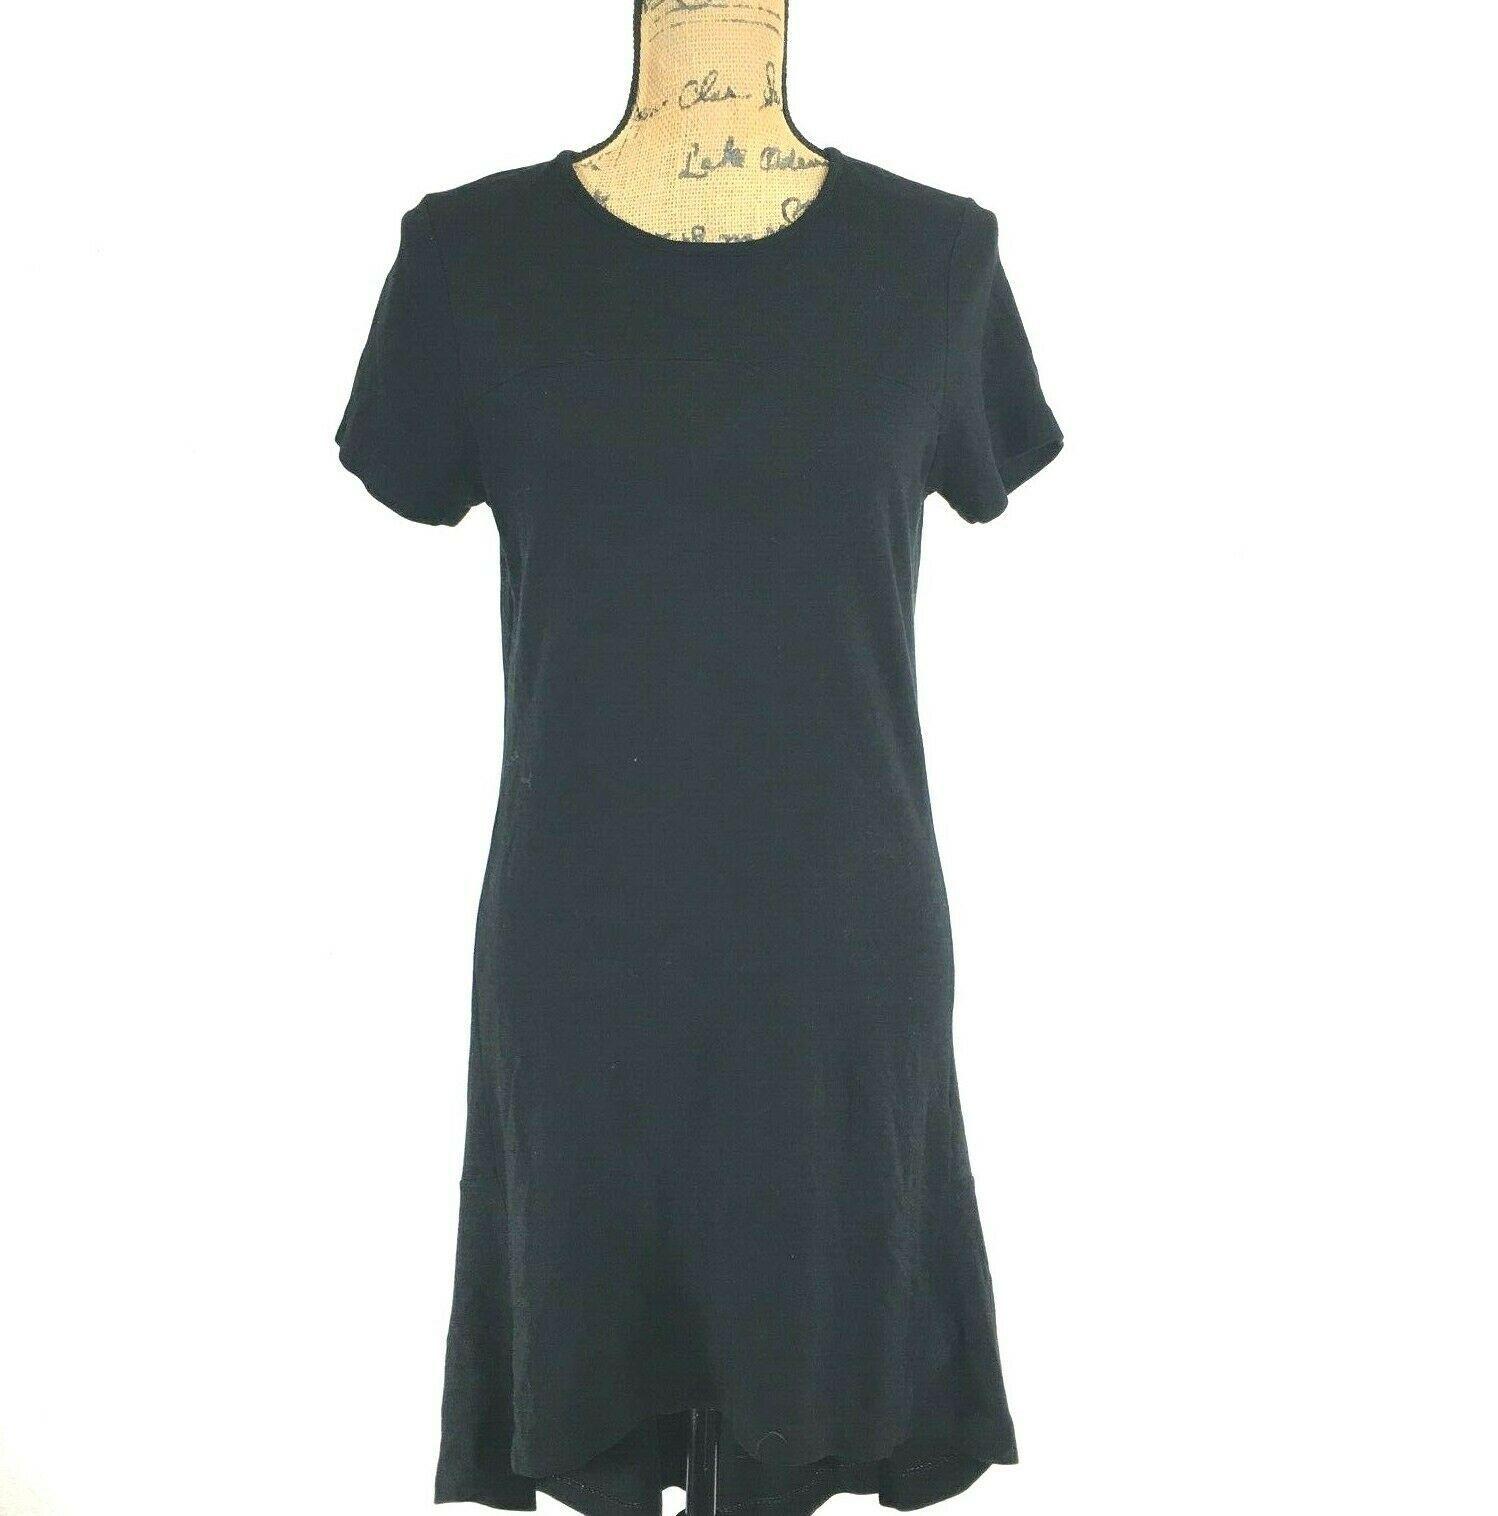 DKNY Donna Karan Dress Sm Black Short Sl Tee Shirt High Low A Line Shift Comfy